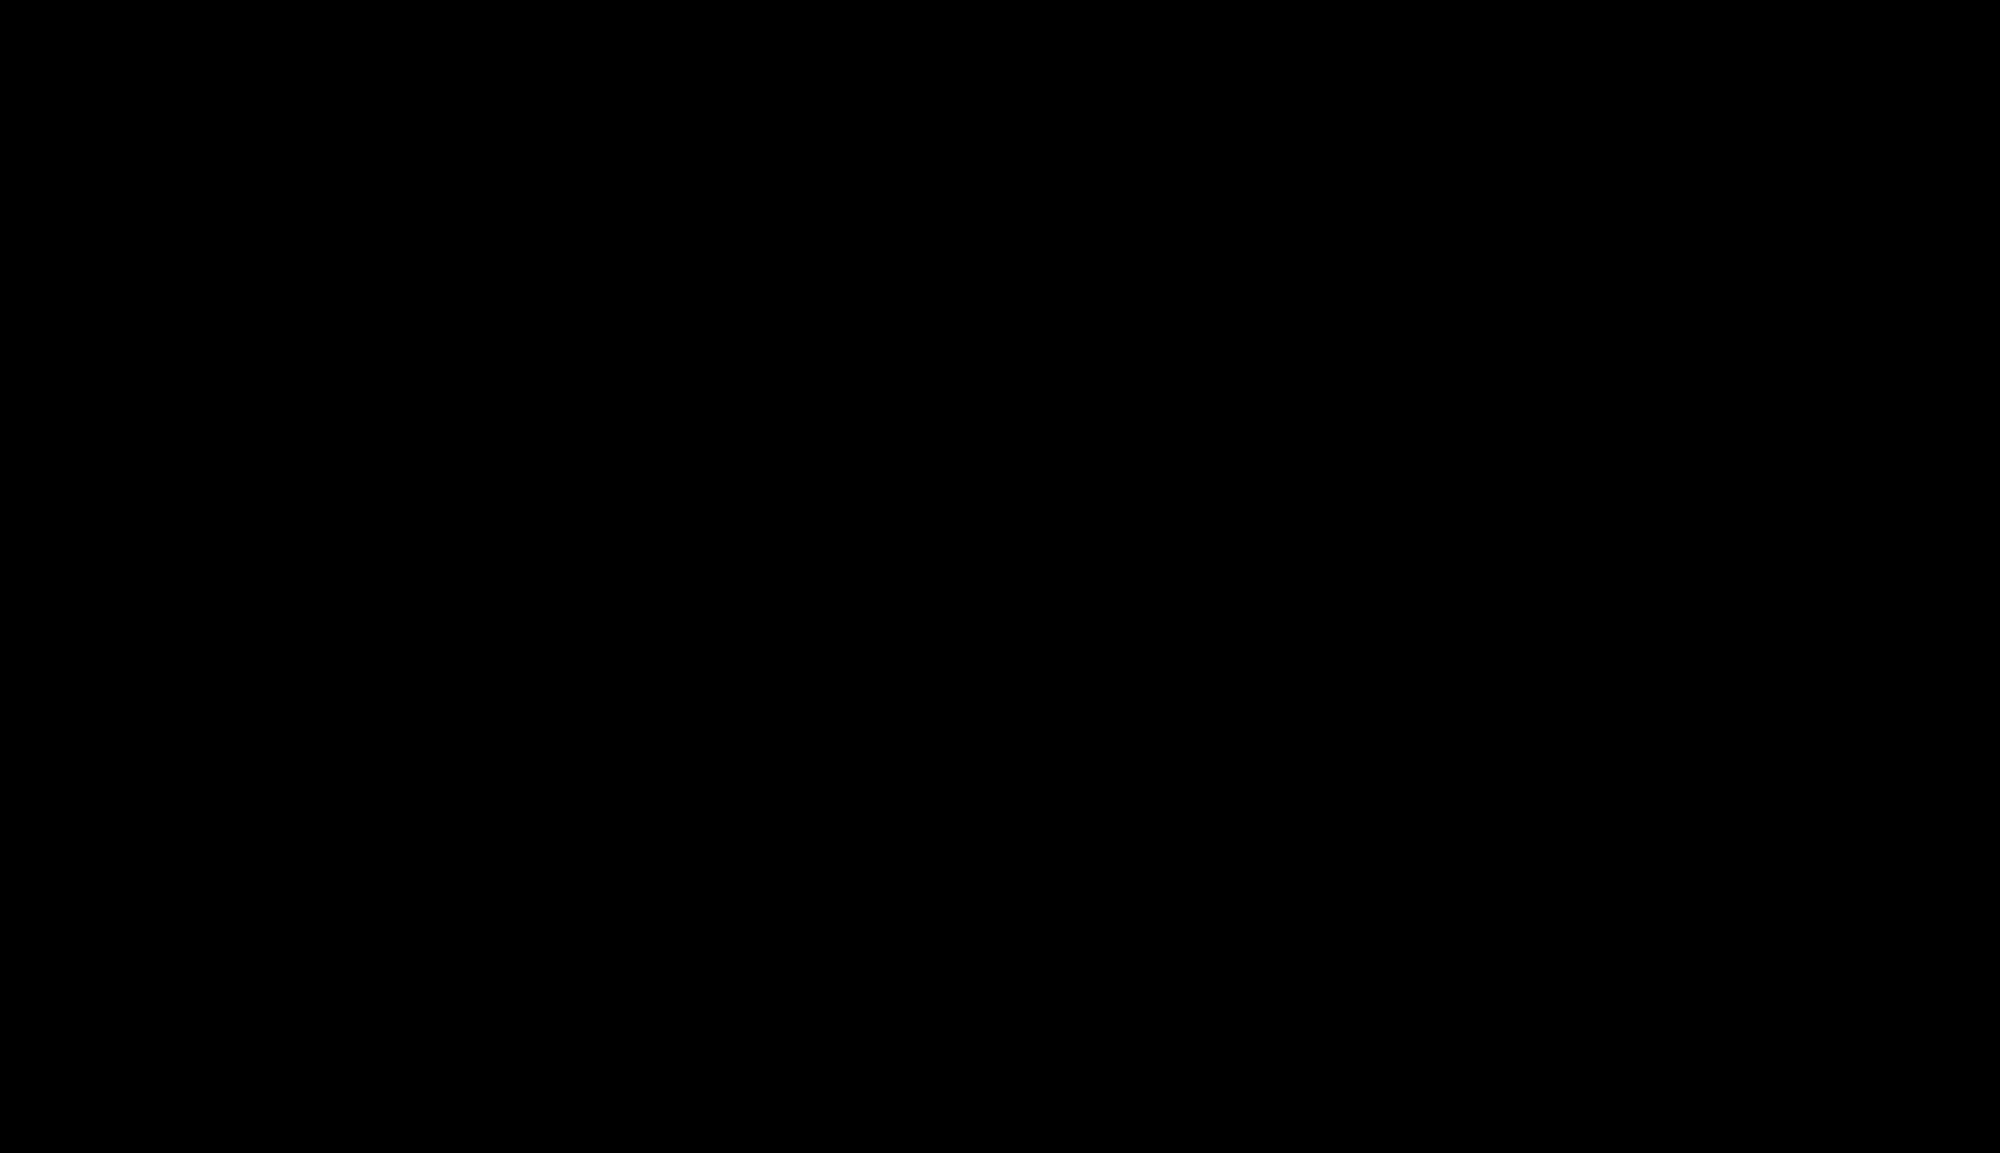 2000x1153 Filestegosaurus Silhouette.svg